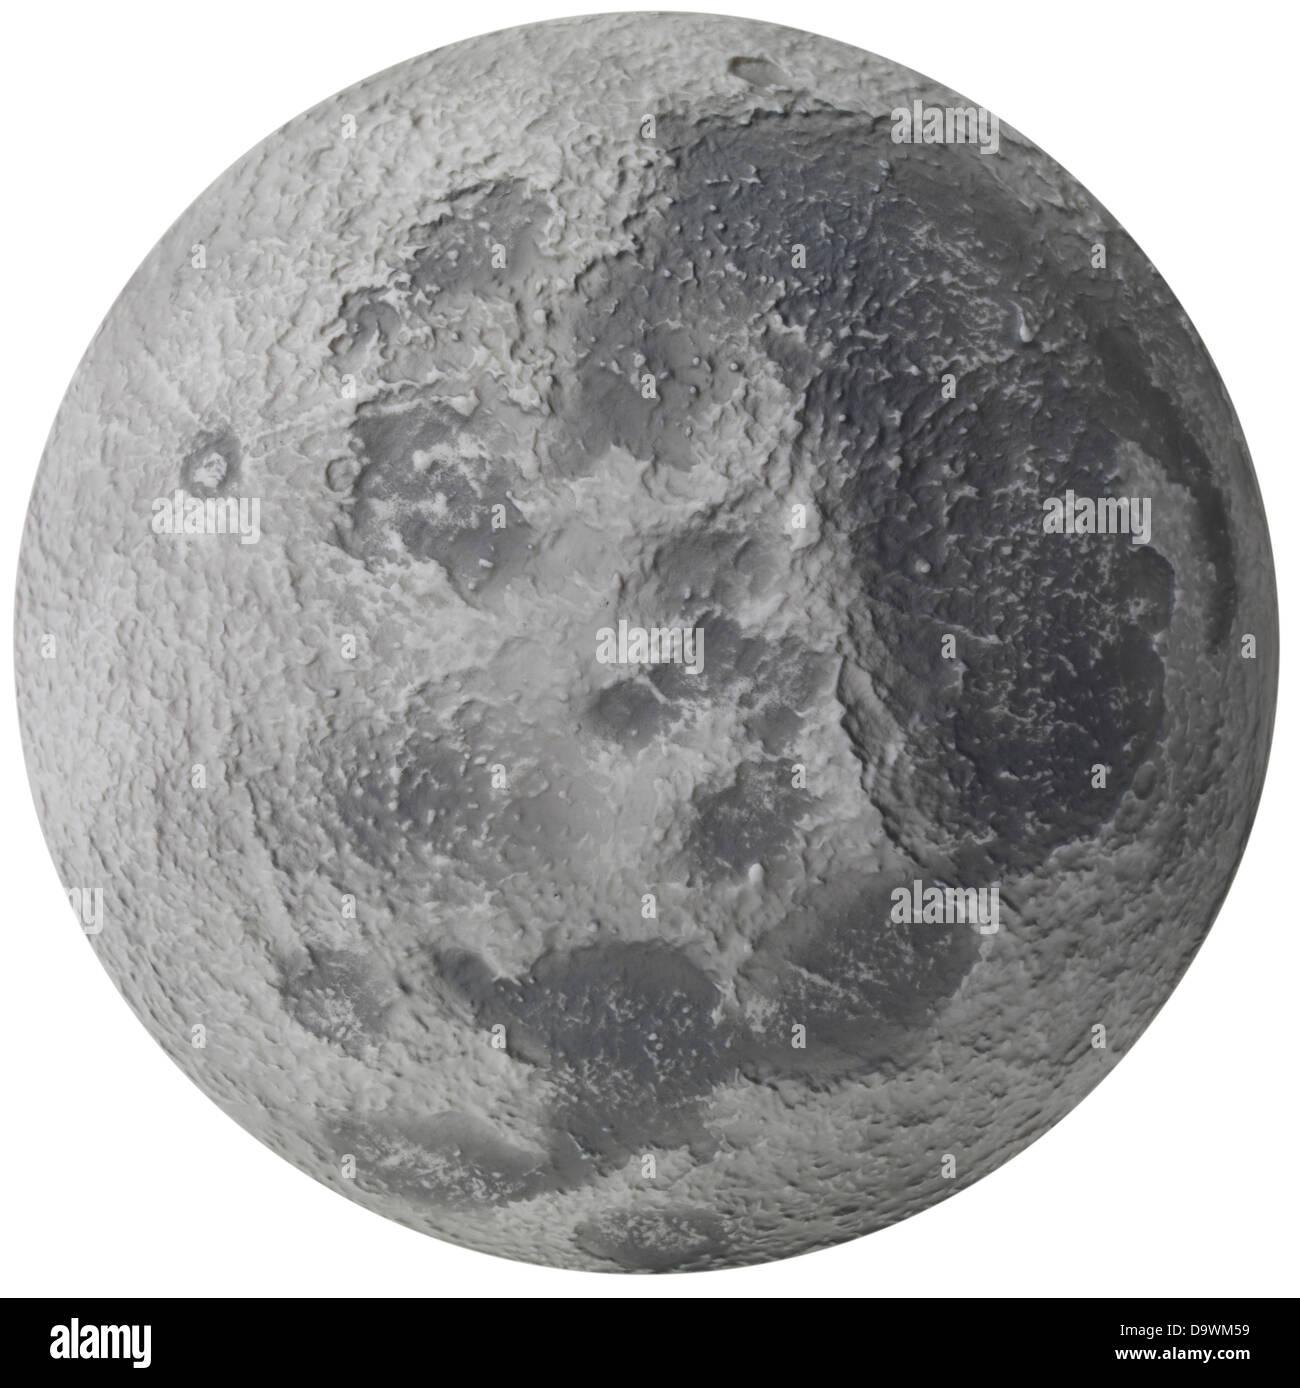 Oberfläche des Mondes Stockbild